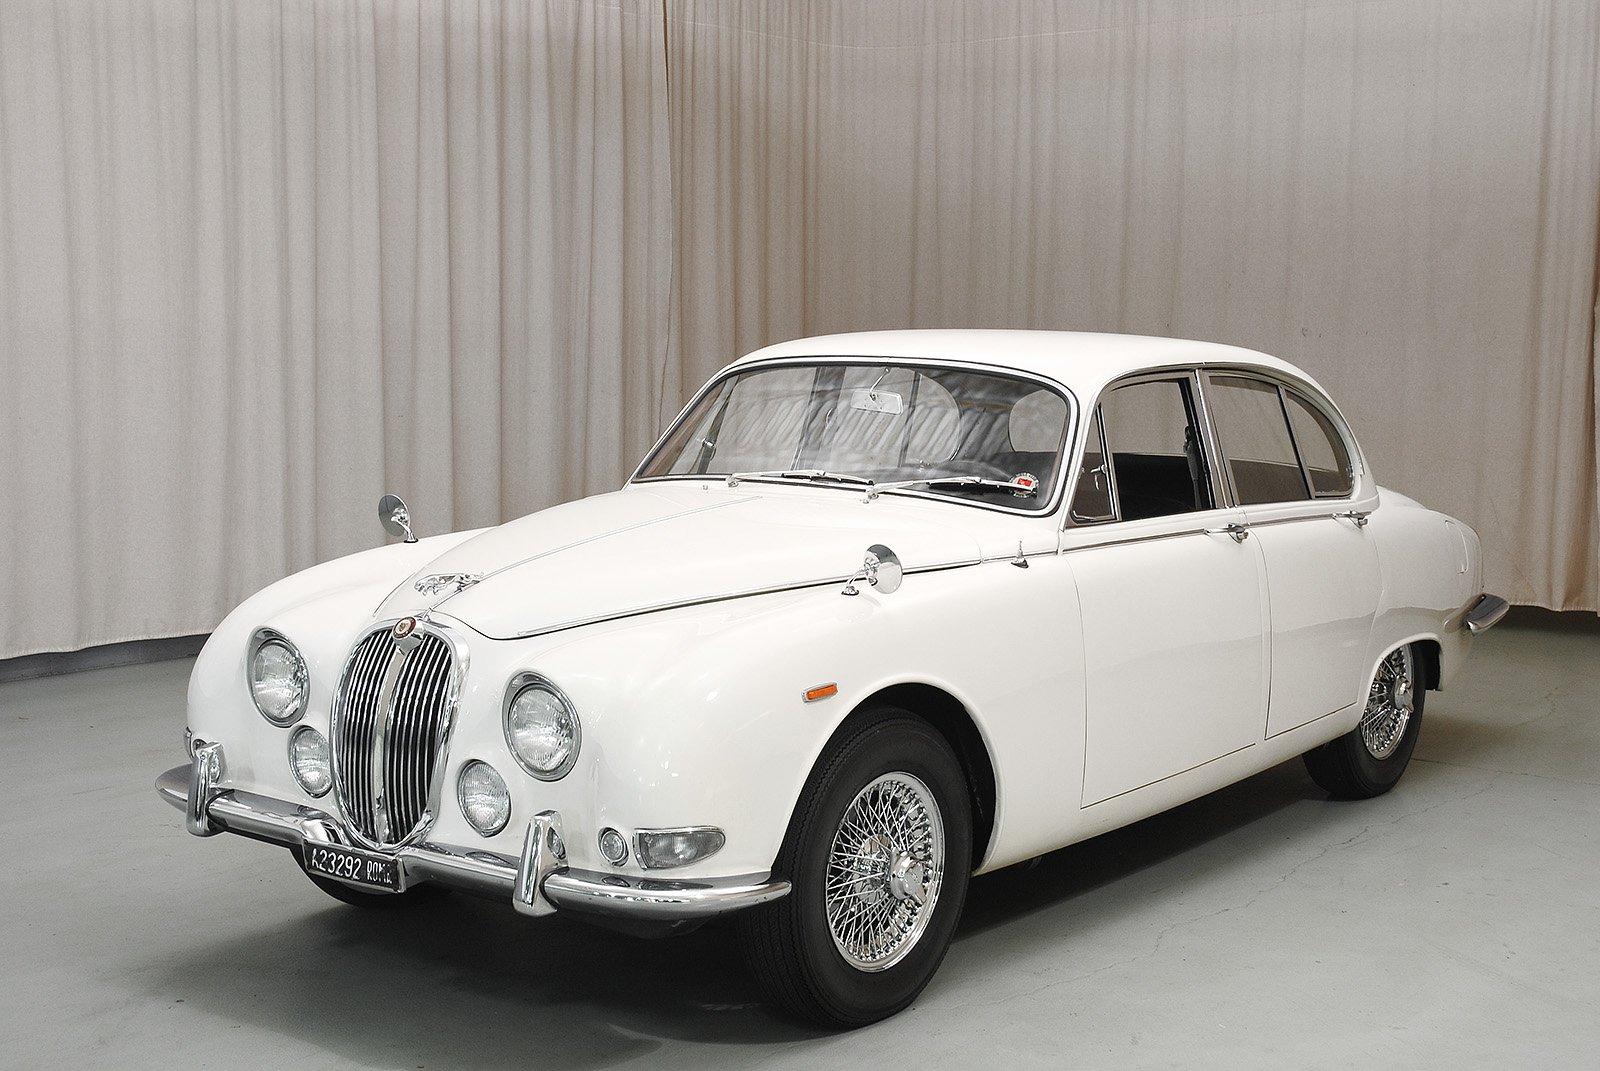 1964 Jaguar 38 S Sedan Hyman Ltd Classic Cars 1950s Sales Archive